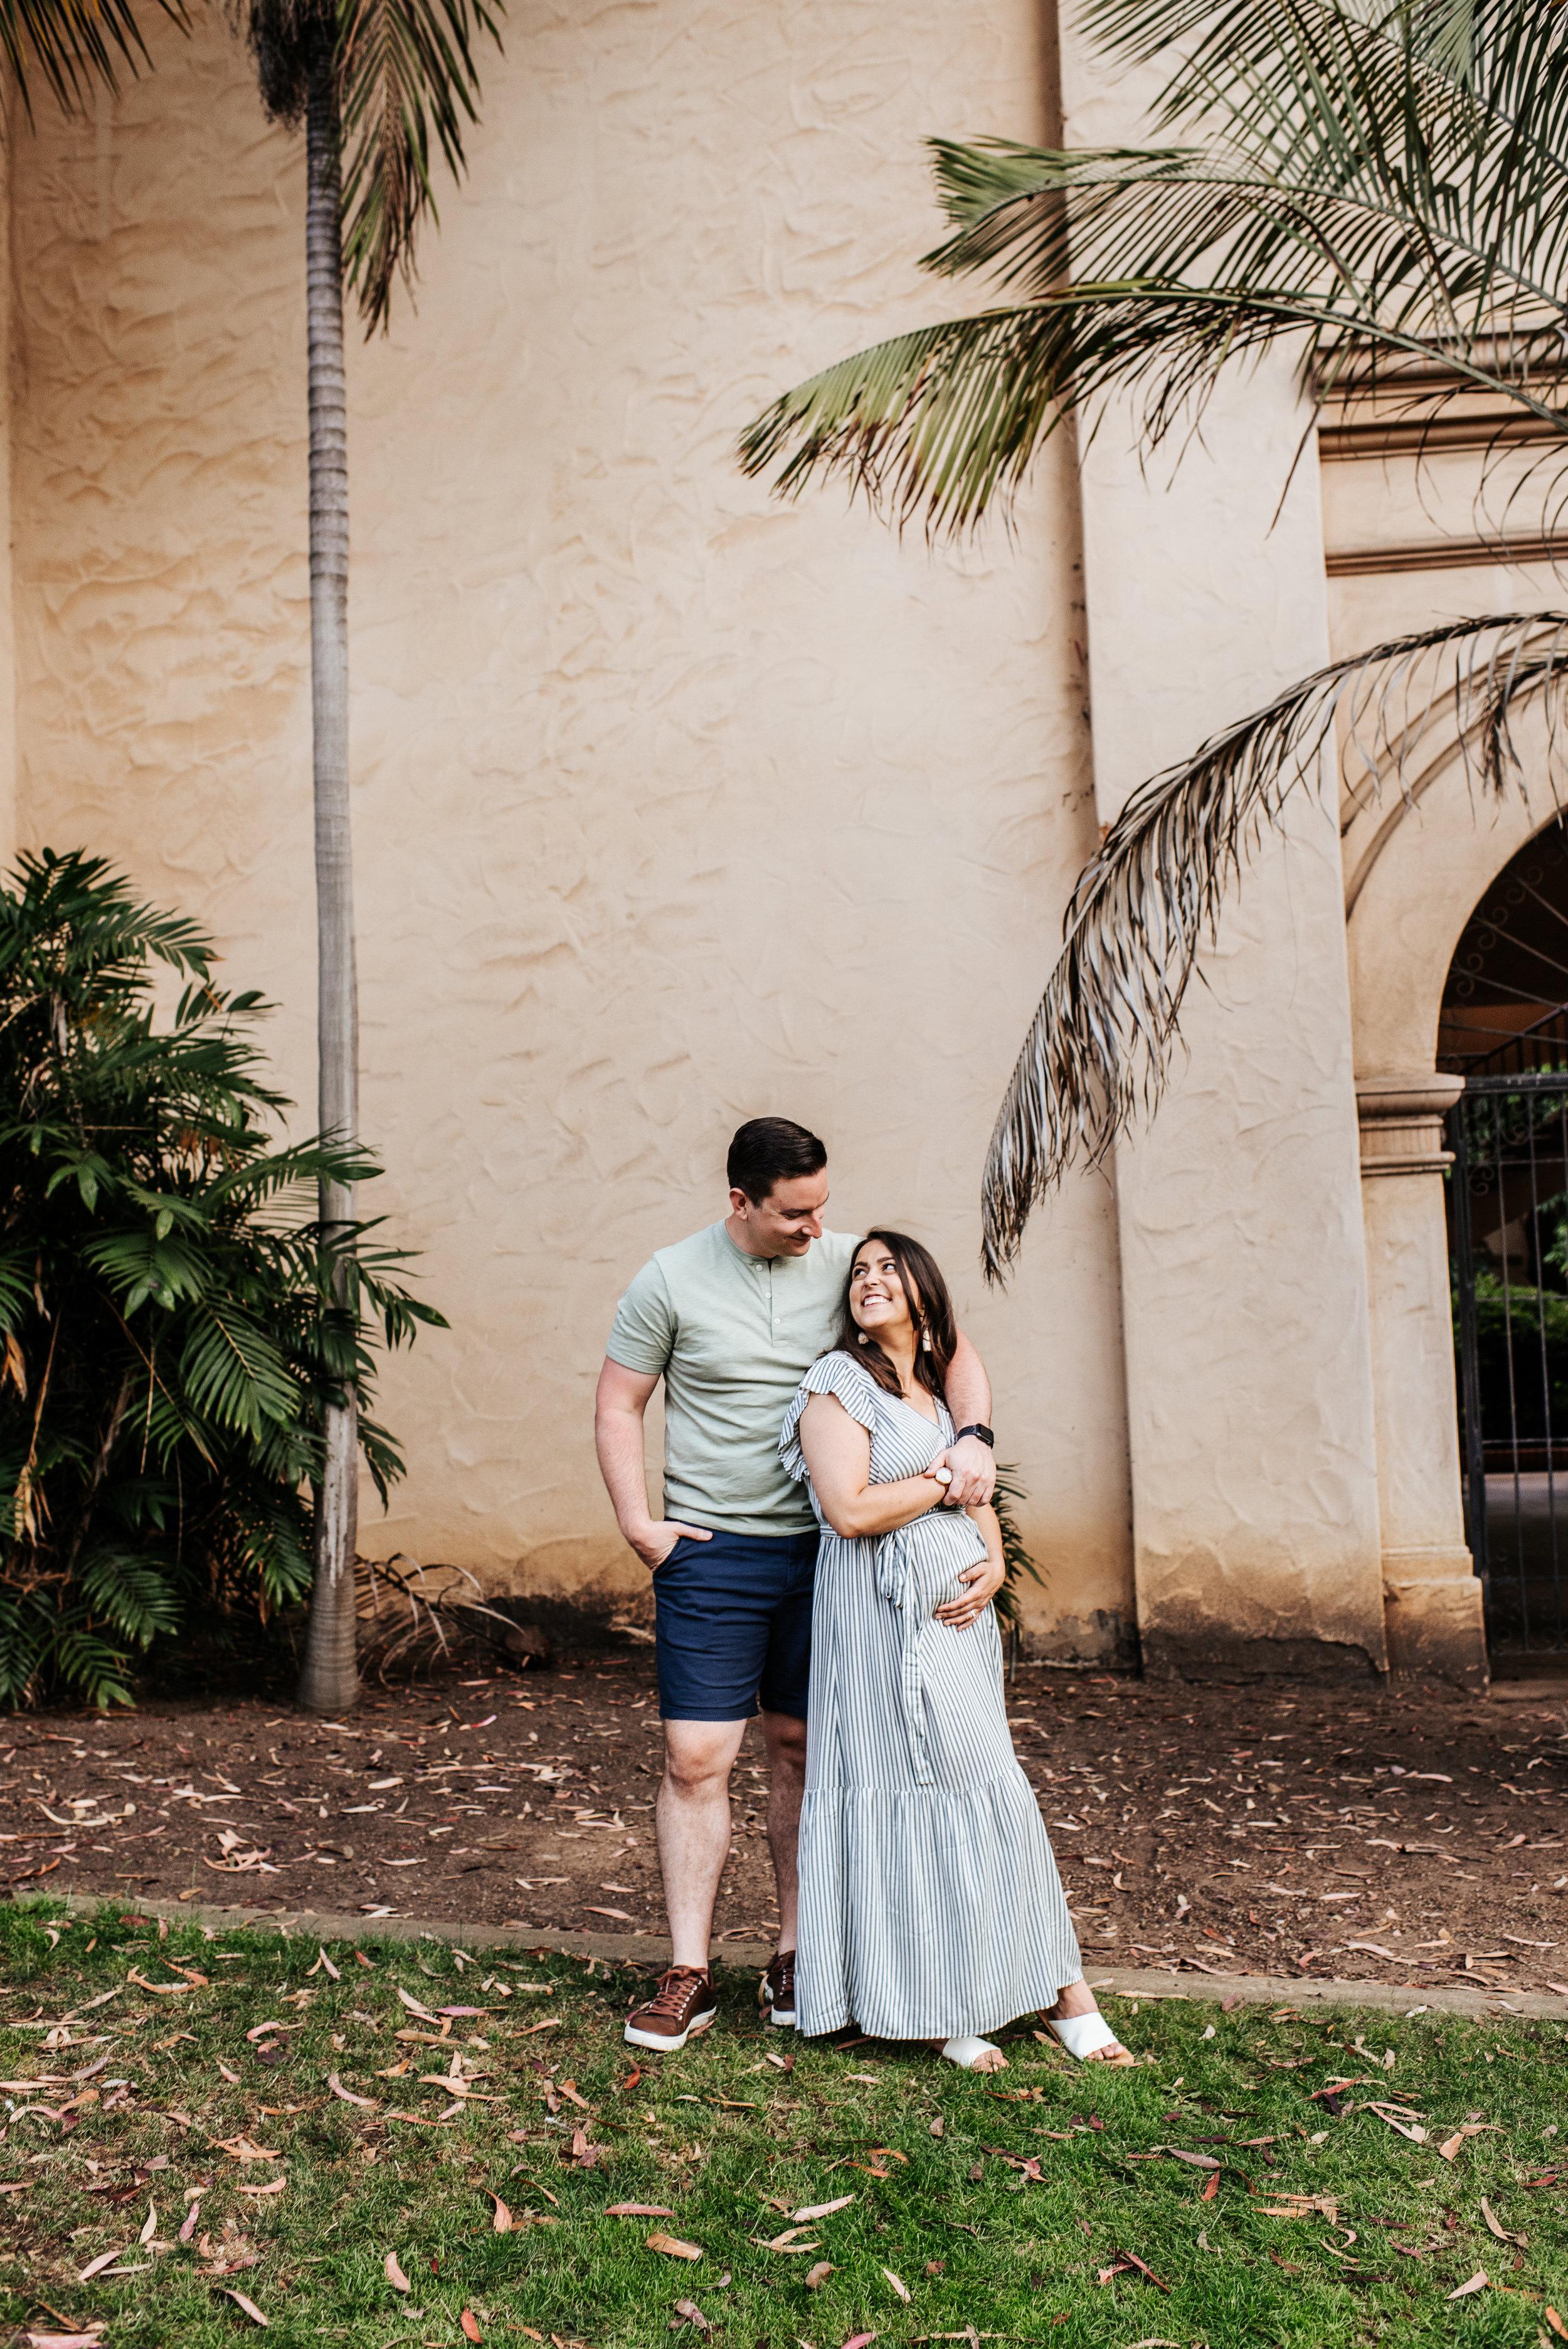 SoCal Standard - San Diego Maternity Photographer - Couples Maternity Session - Balboa Park Cactus Garden -128.jpg